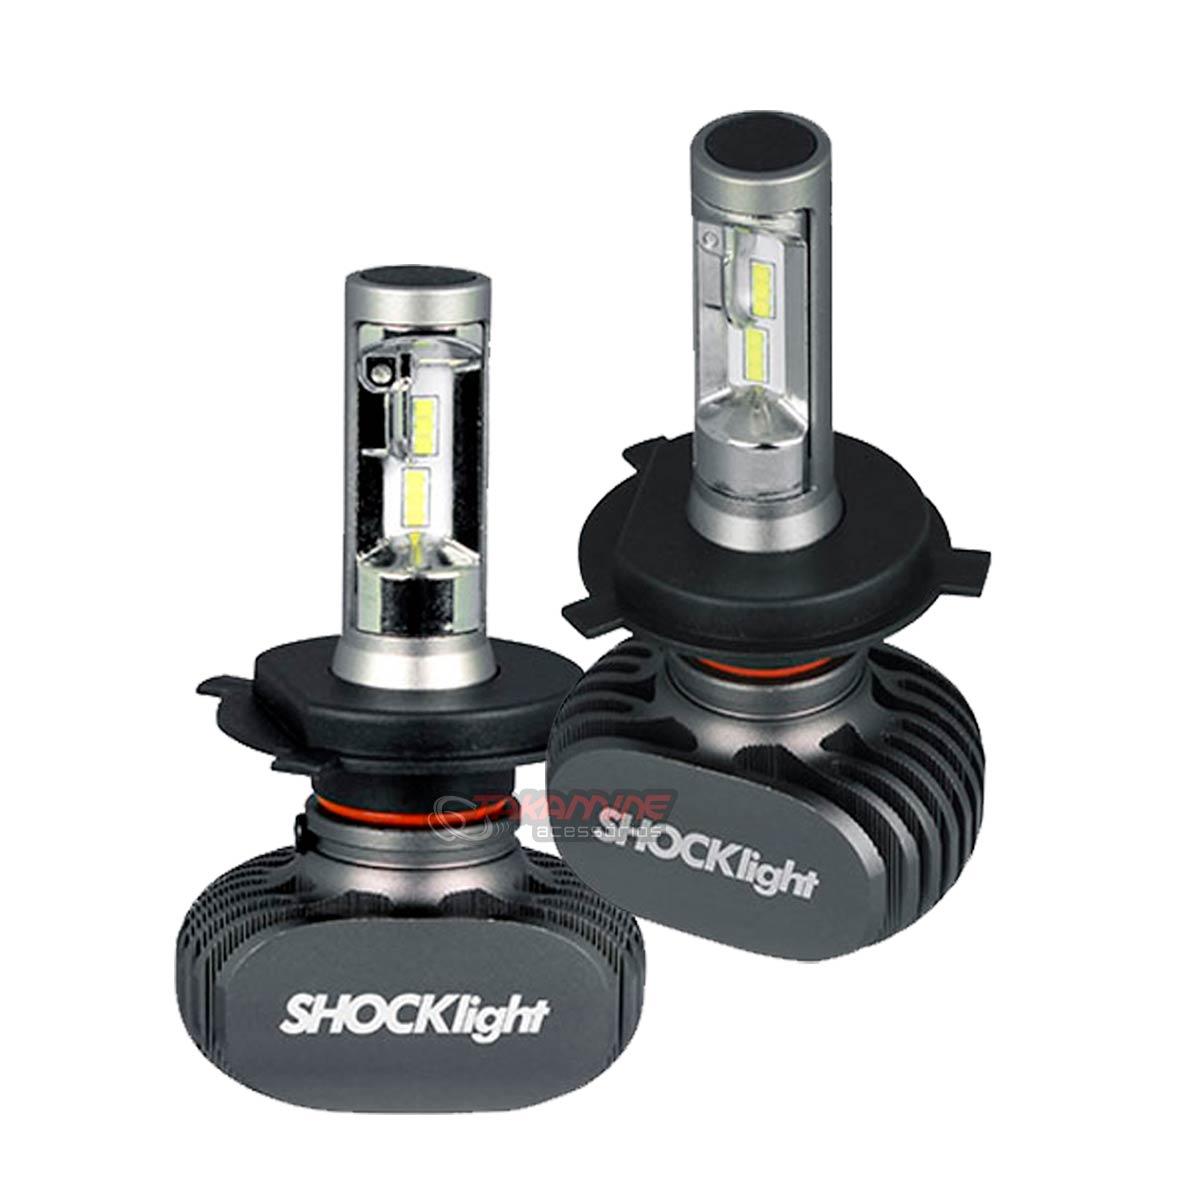 Kit Ultra LED Gol G6 farol simples 2013 2014 2015 2016 tipo xenon  farol alto e baixo H4 50W